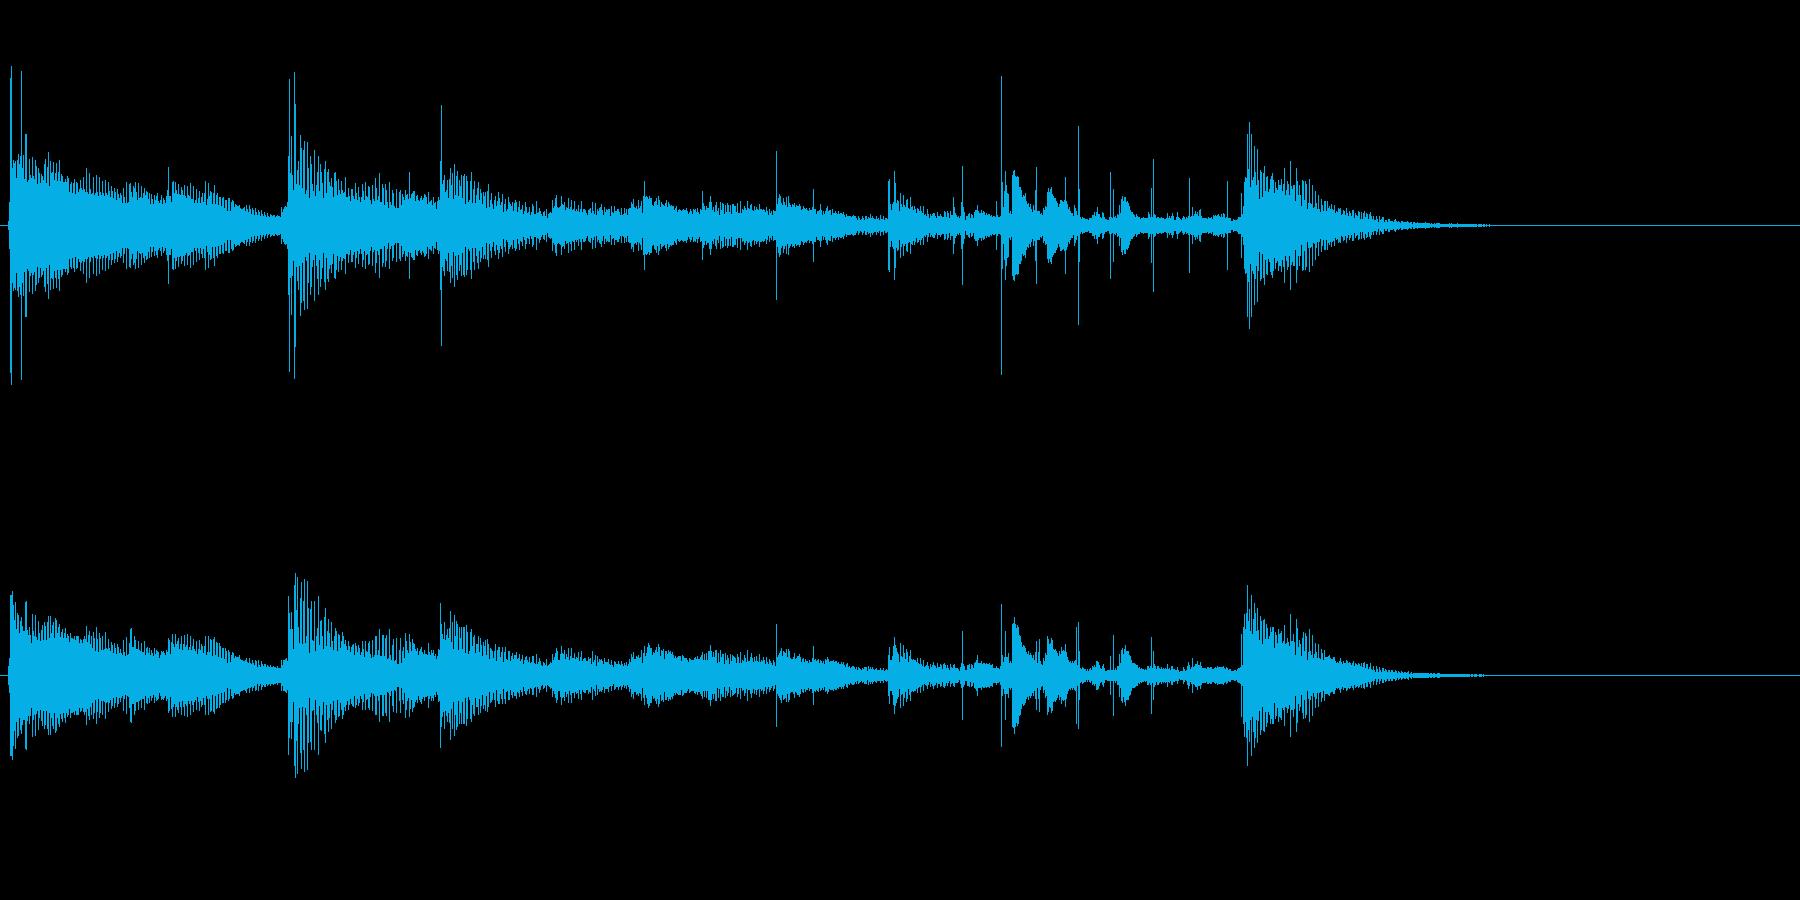 8bitゲーム風アイキャッチ音の再生済みの波形